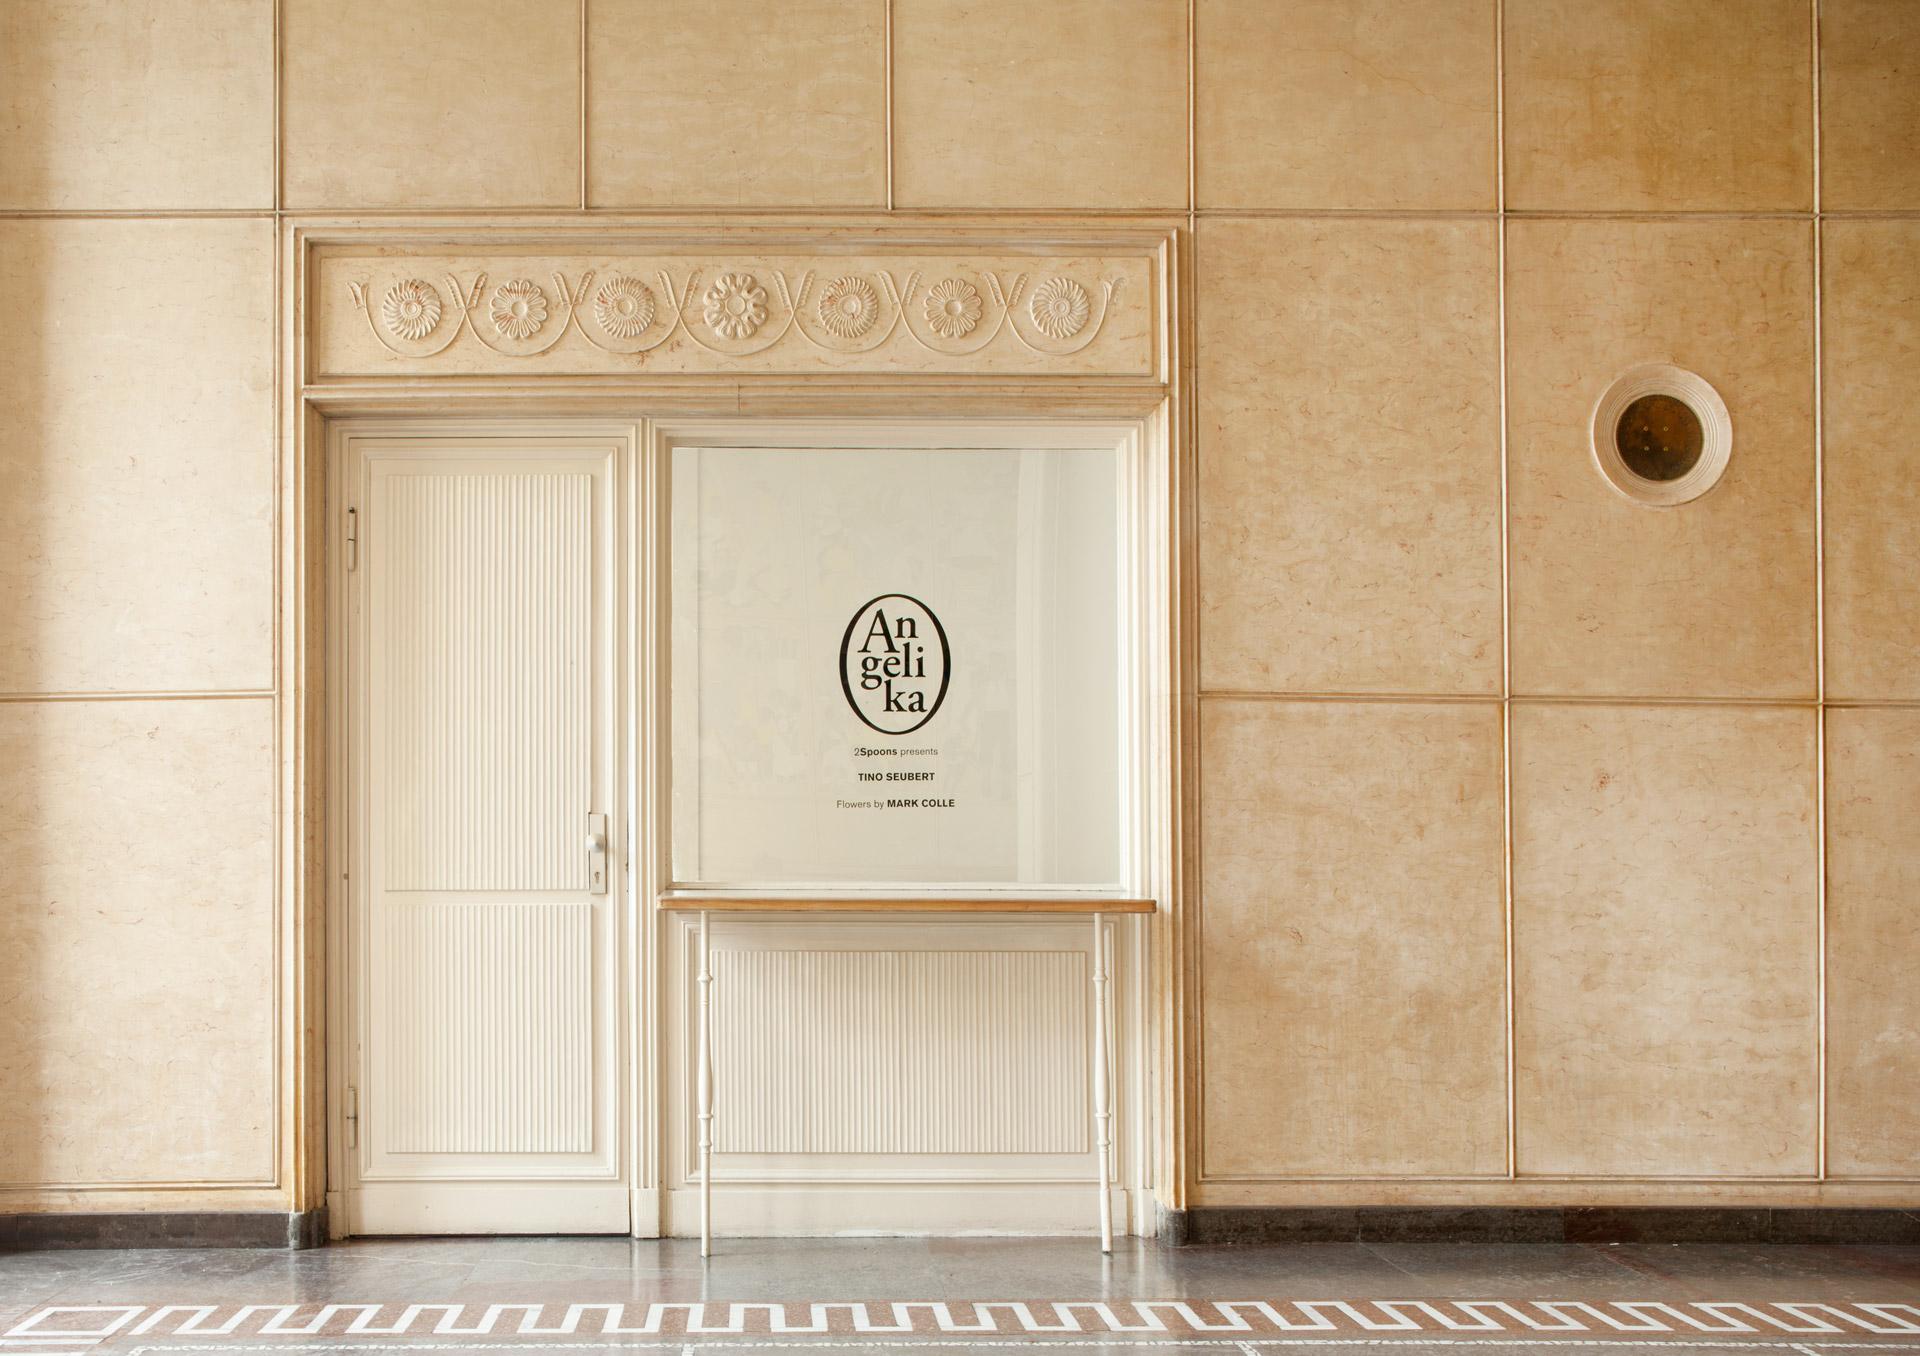 Tino Seubert - Narcissus Vases - Exhibition View